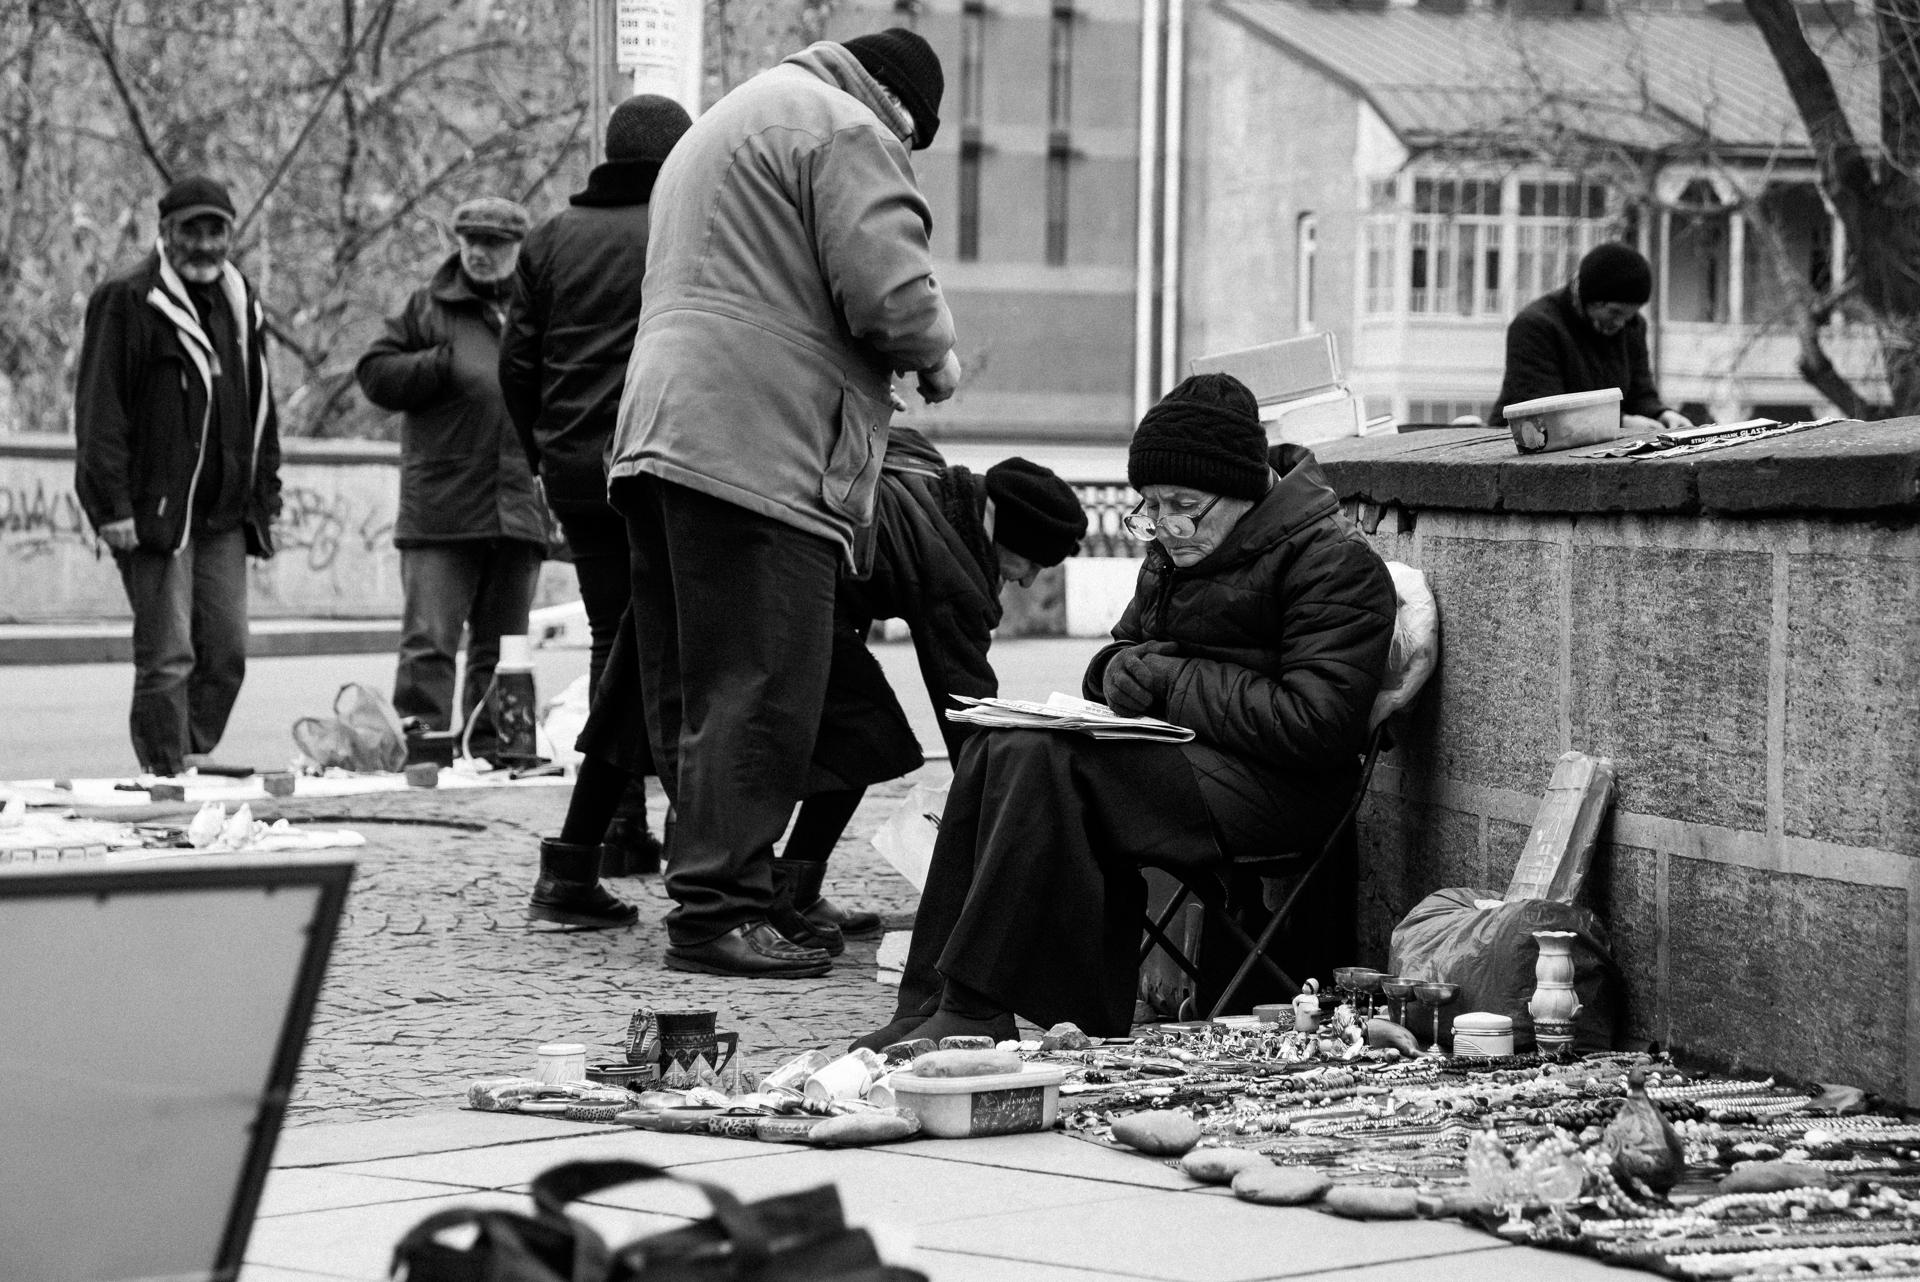 tbilisi-georgia-black-and-white-photography (14).jpg